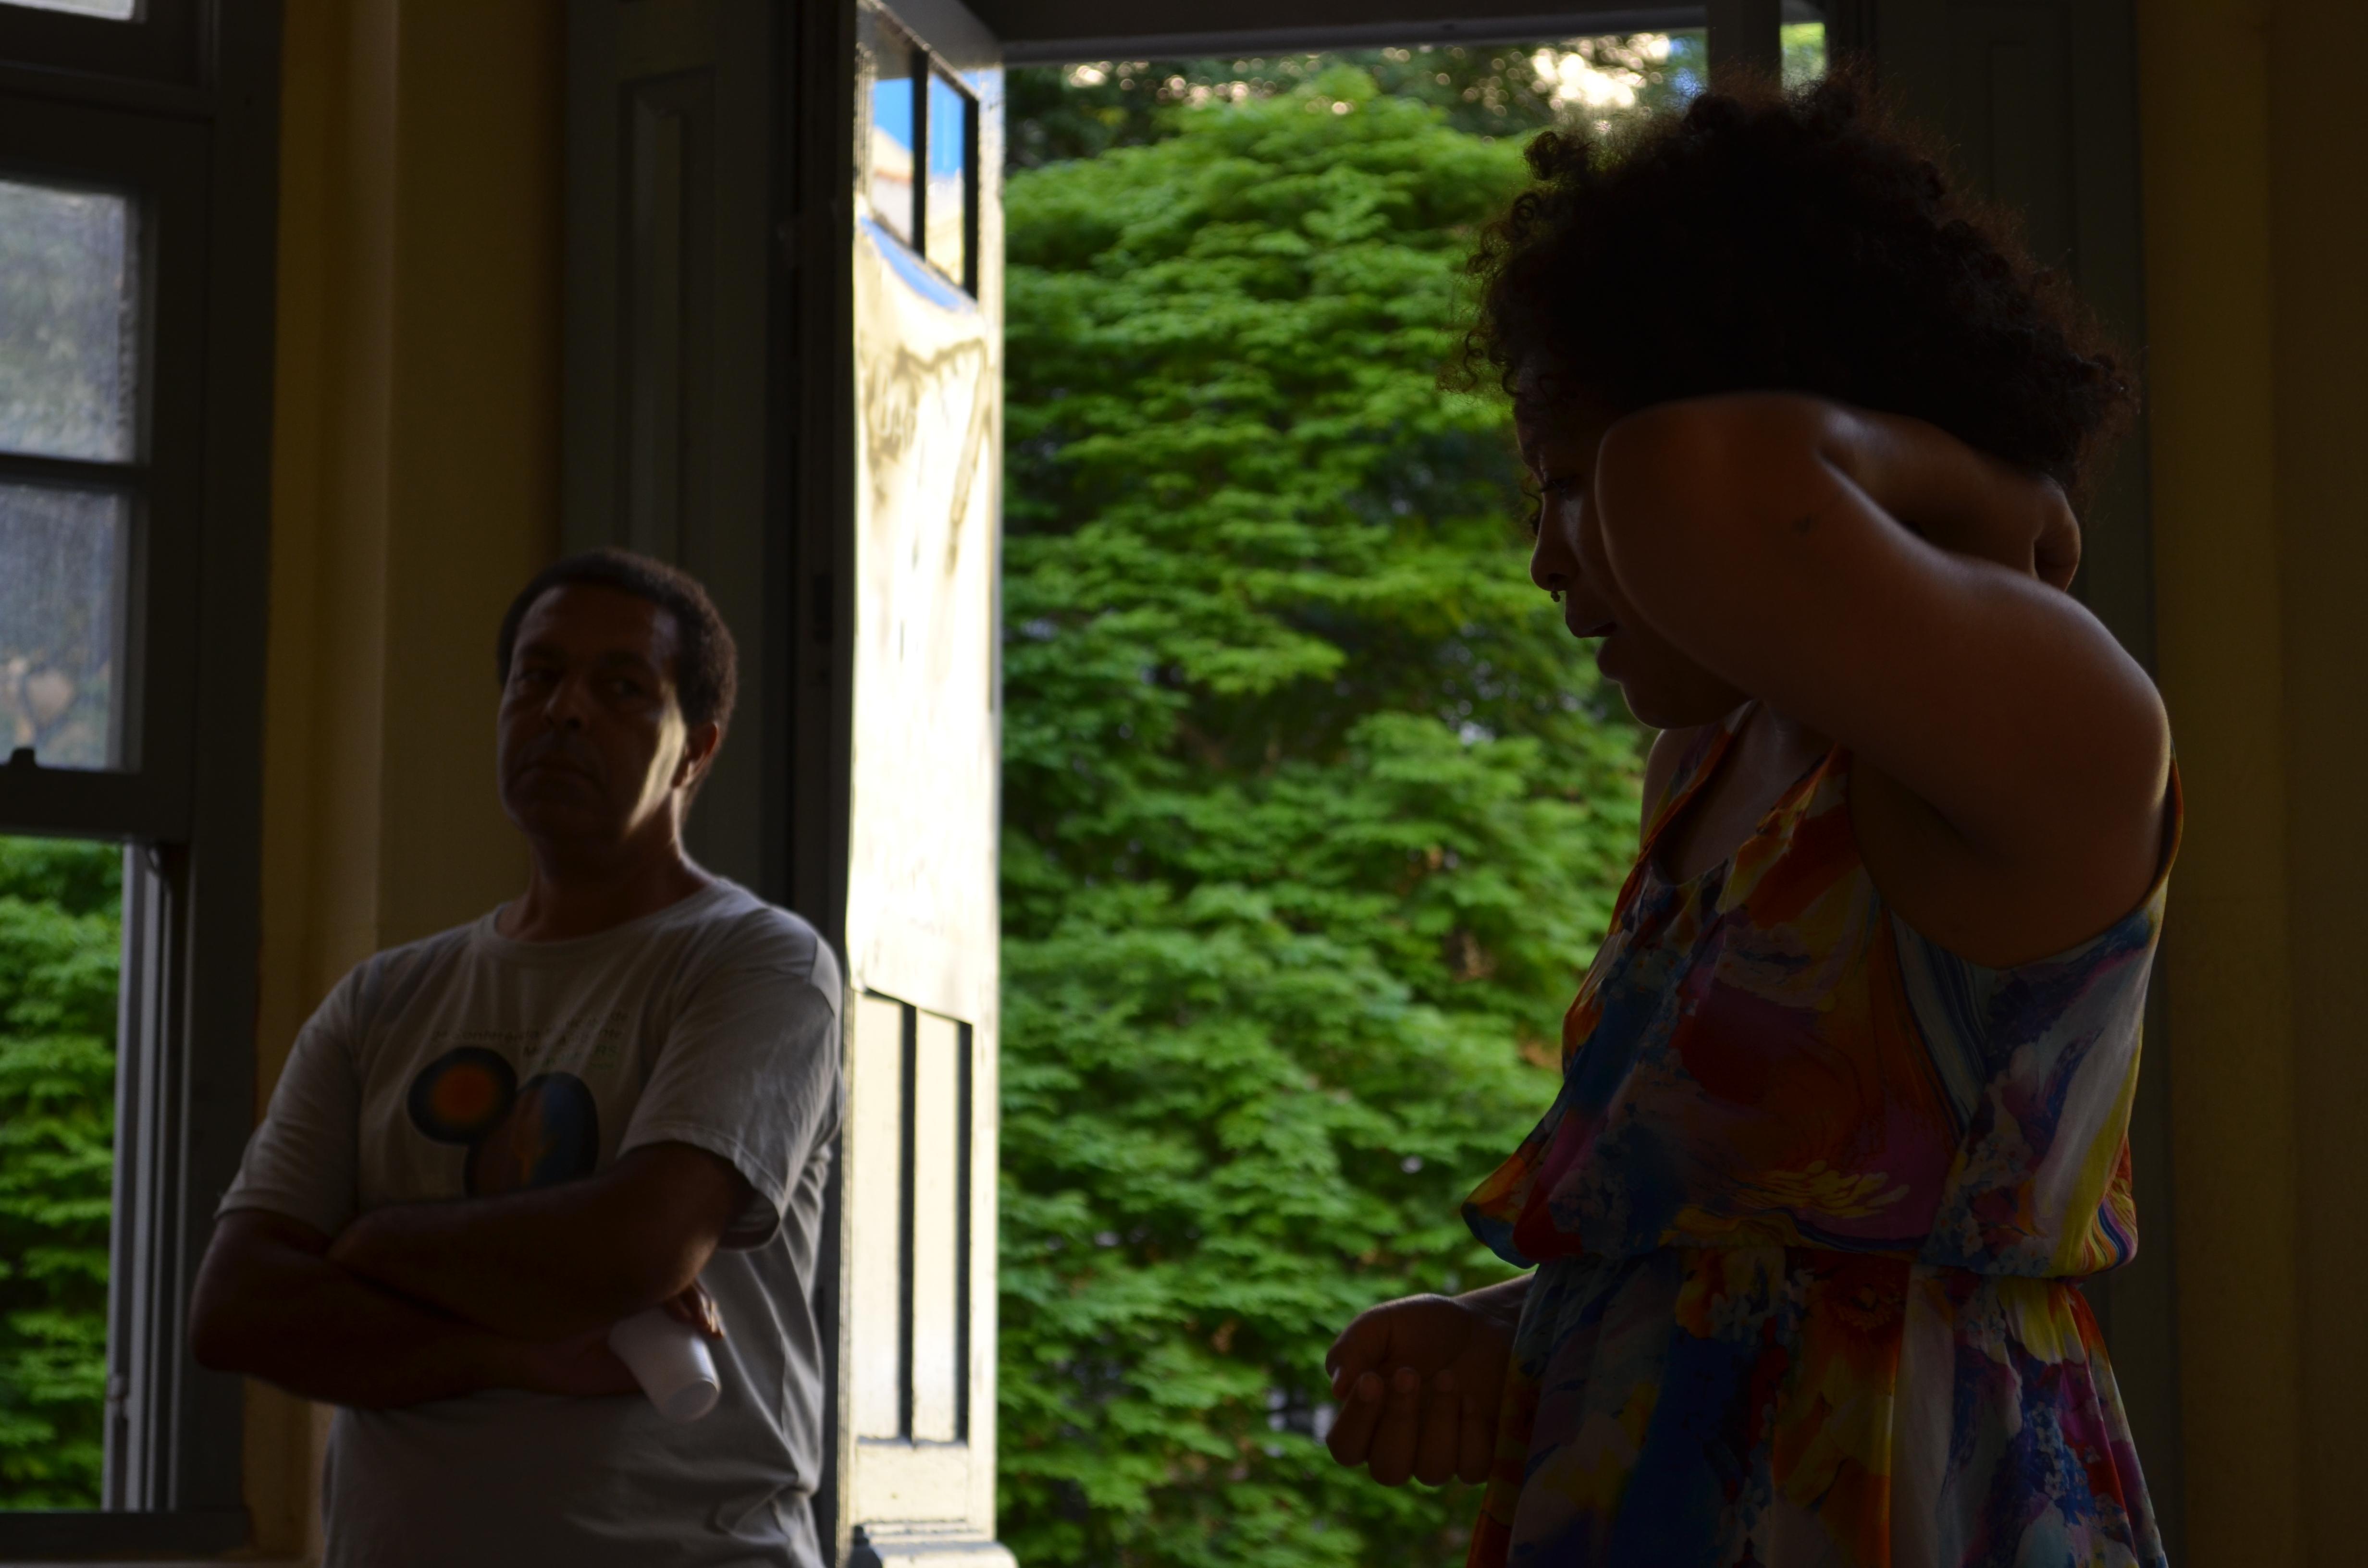 fotos_procura_à_casa._ProjetoCasaGrande_(26).JPG